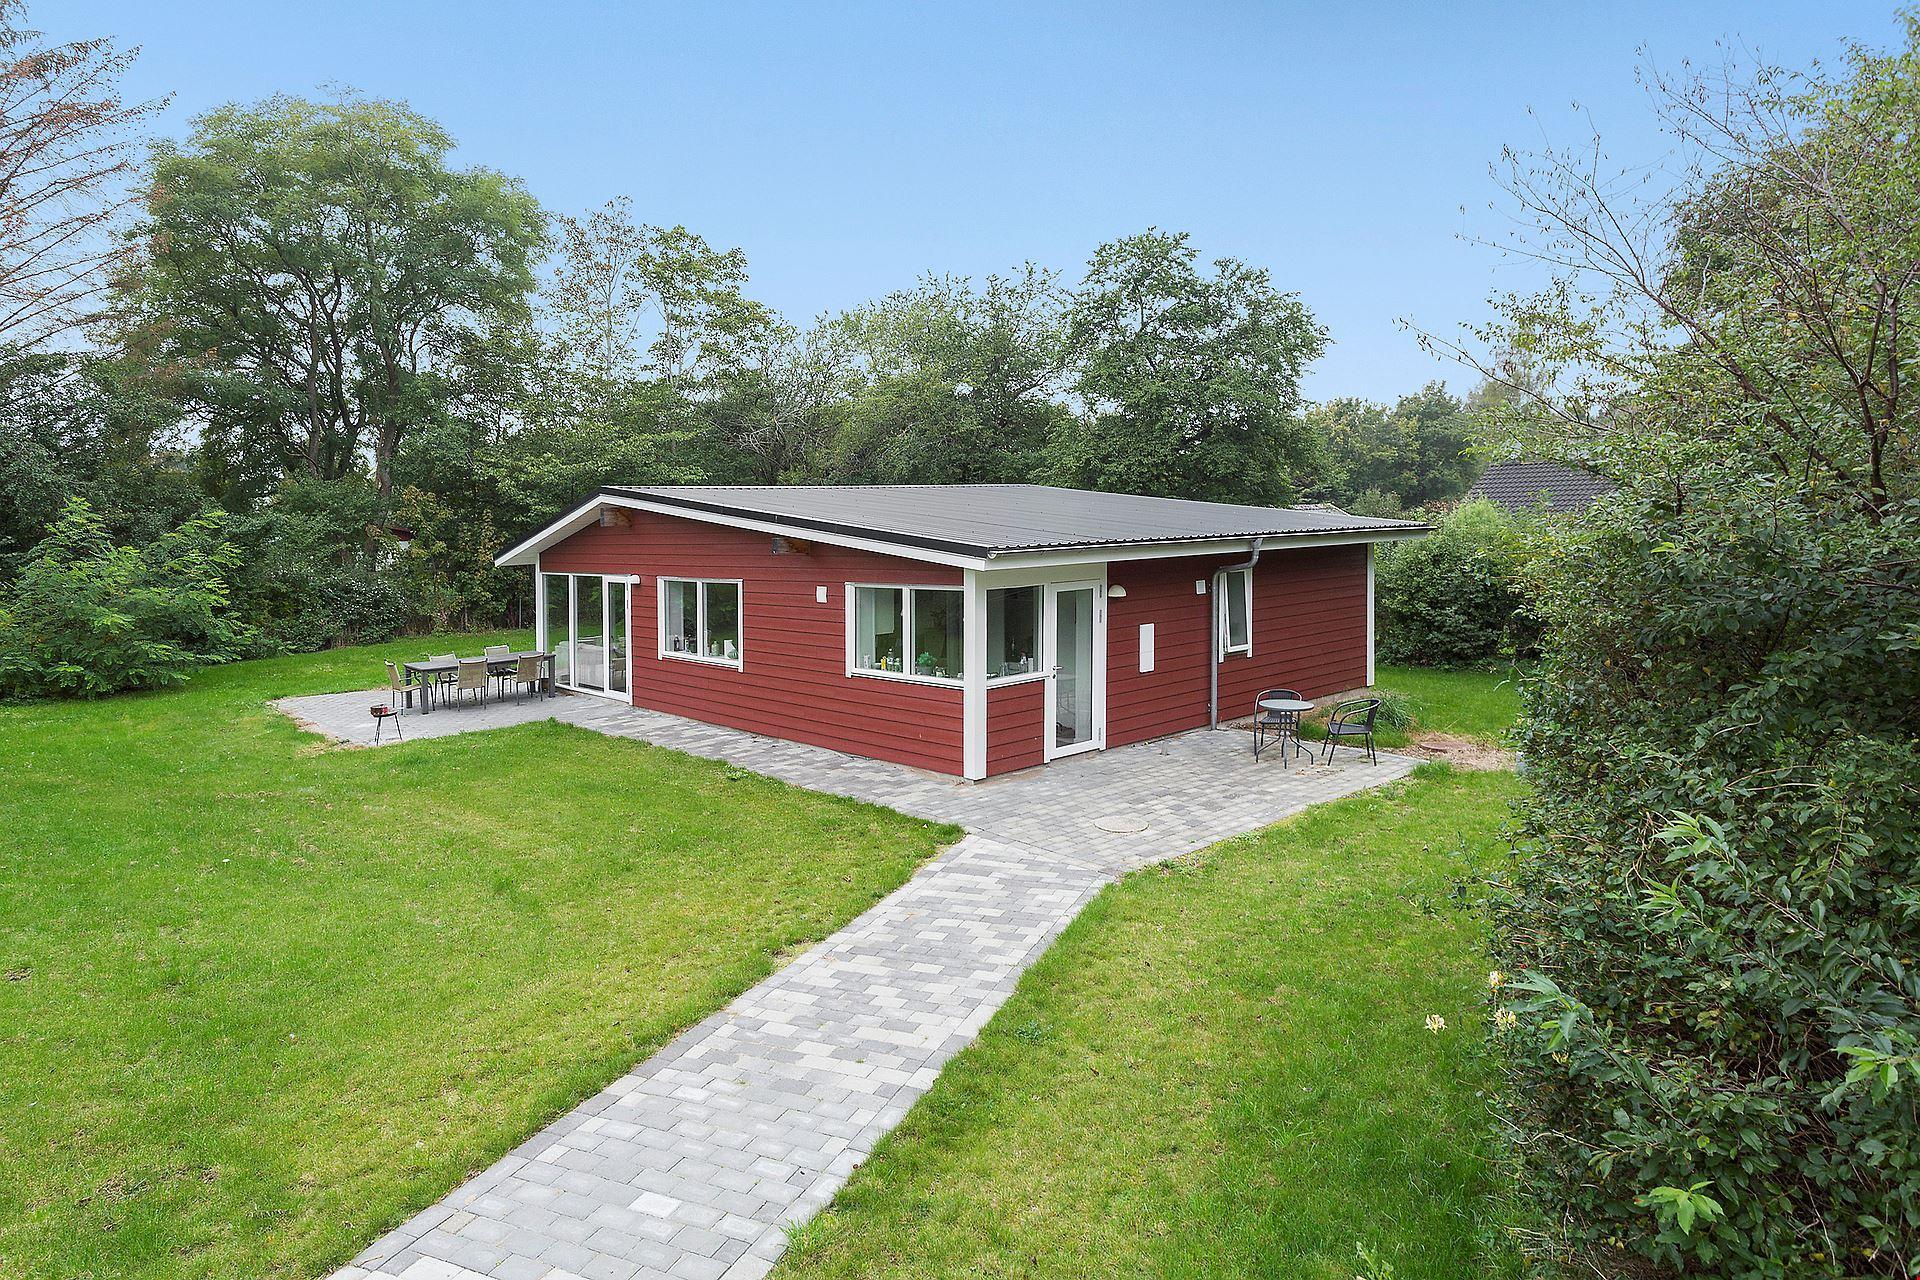 Bjarnesvej 10, 4593 Eskebjerg